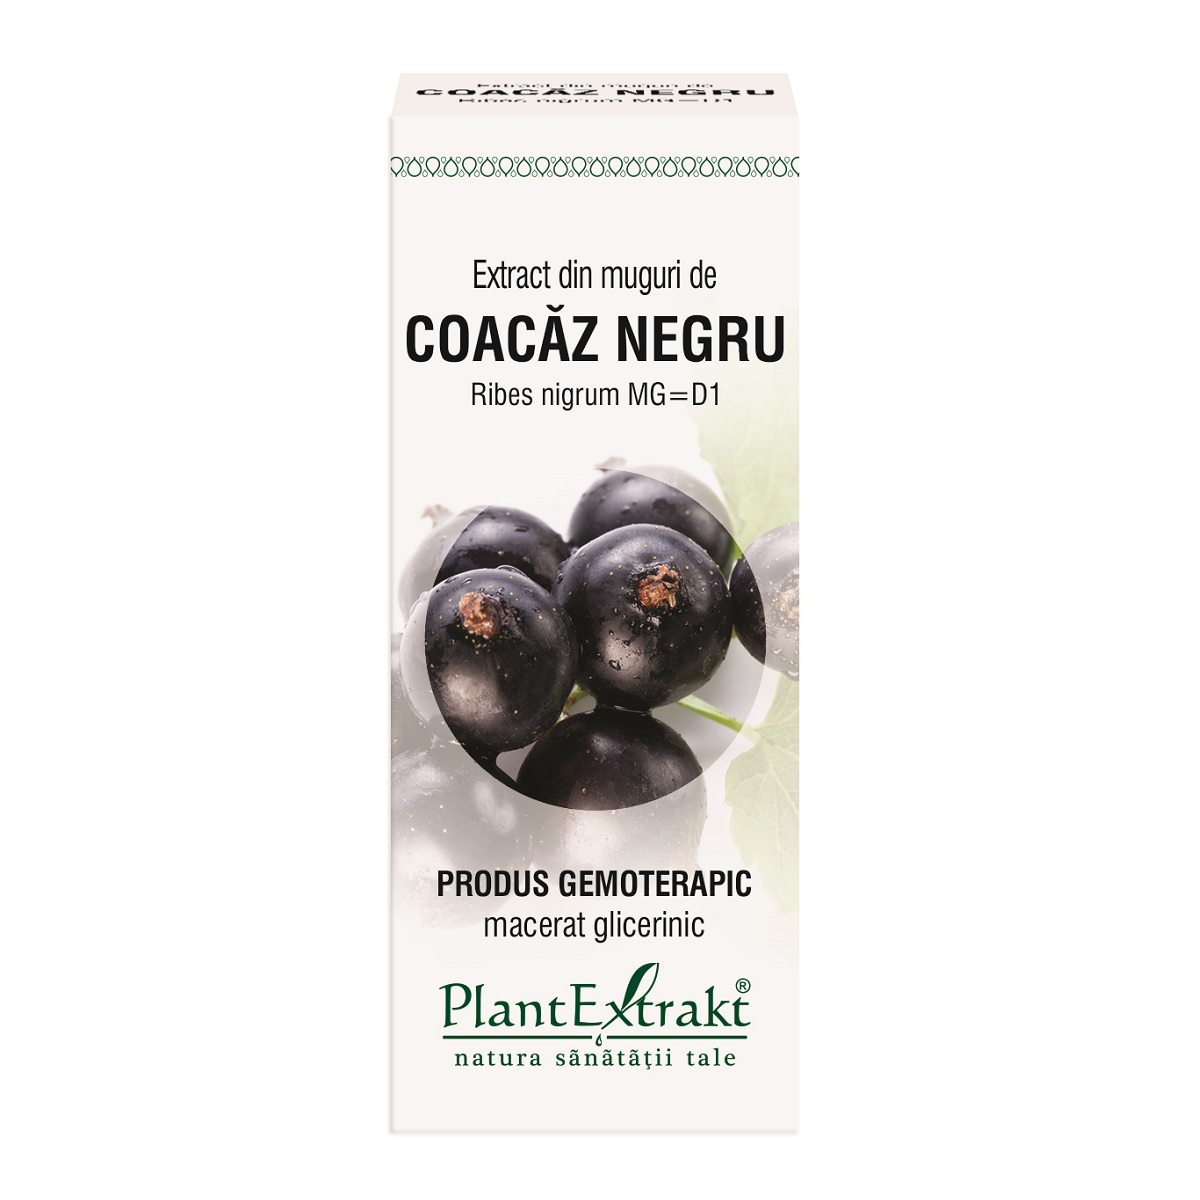 Extract din muguri de coacaz negru, 50ml, Plant Extrakt imagine produs 2021